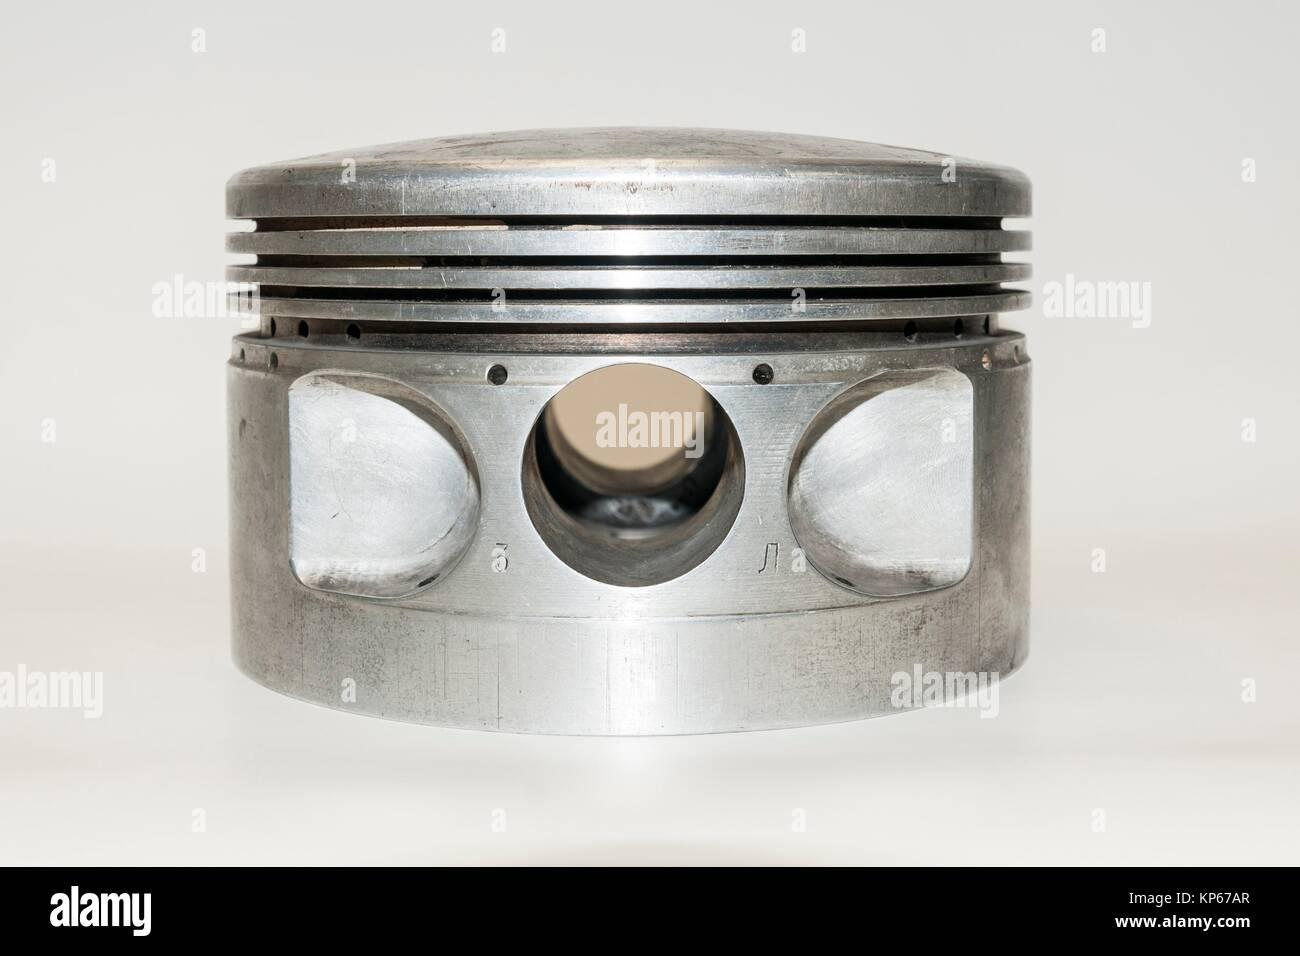 Piston, part of automotive engine - Stock Image